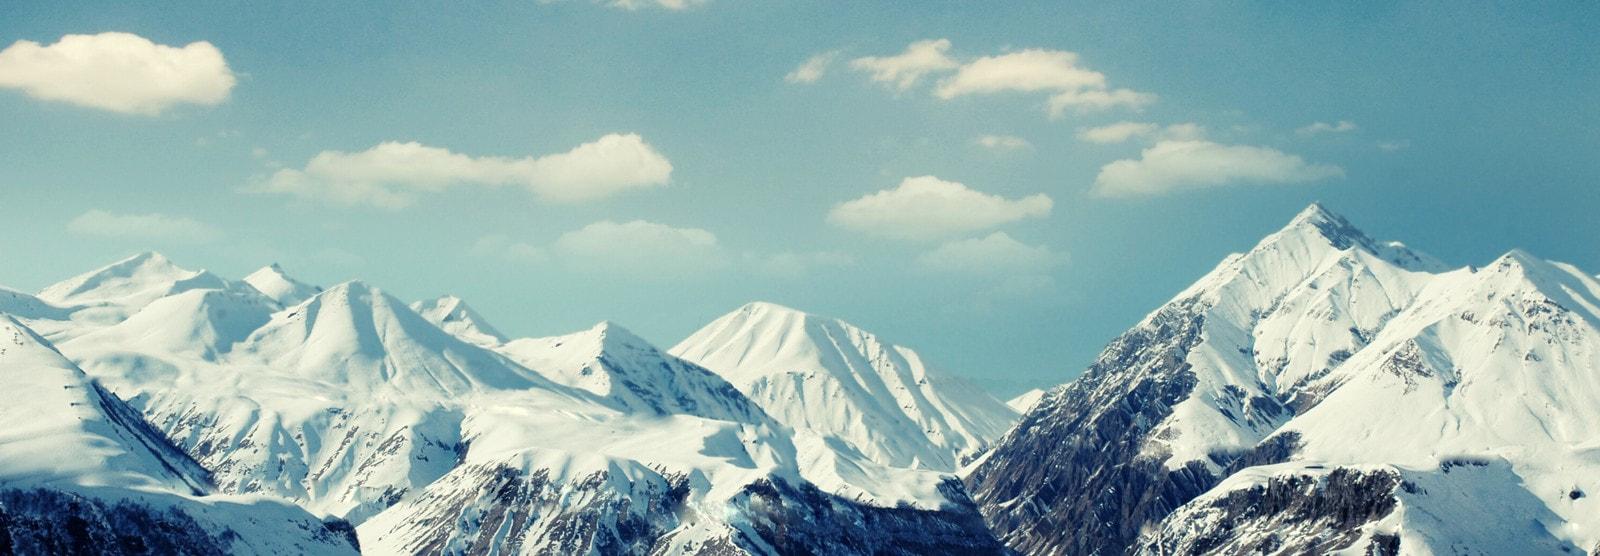 Snowy Mountaintops Profile Header